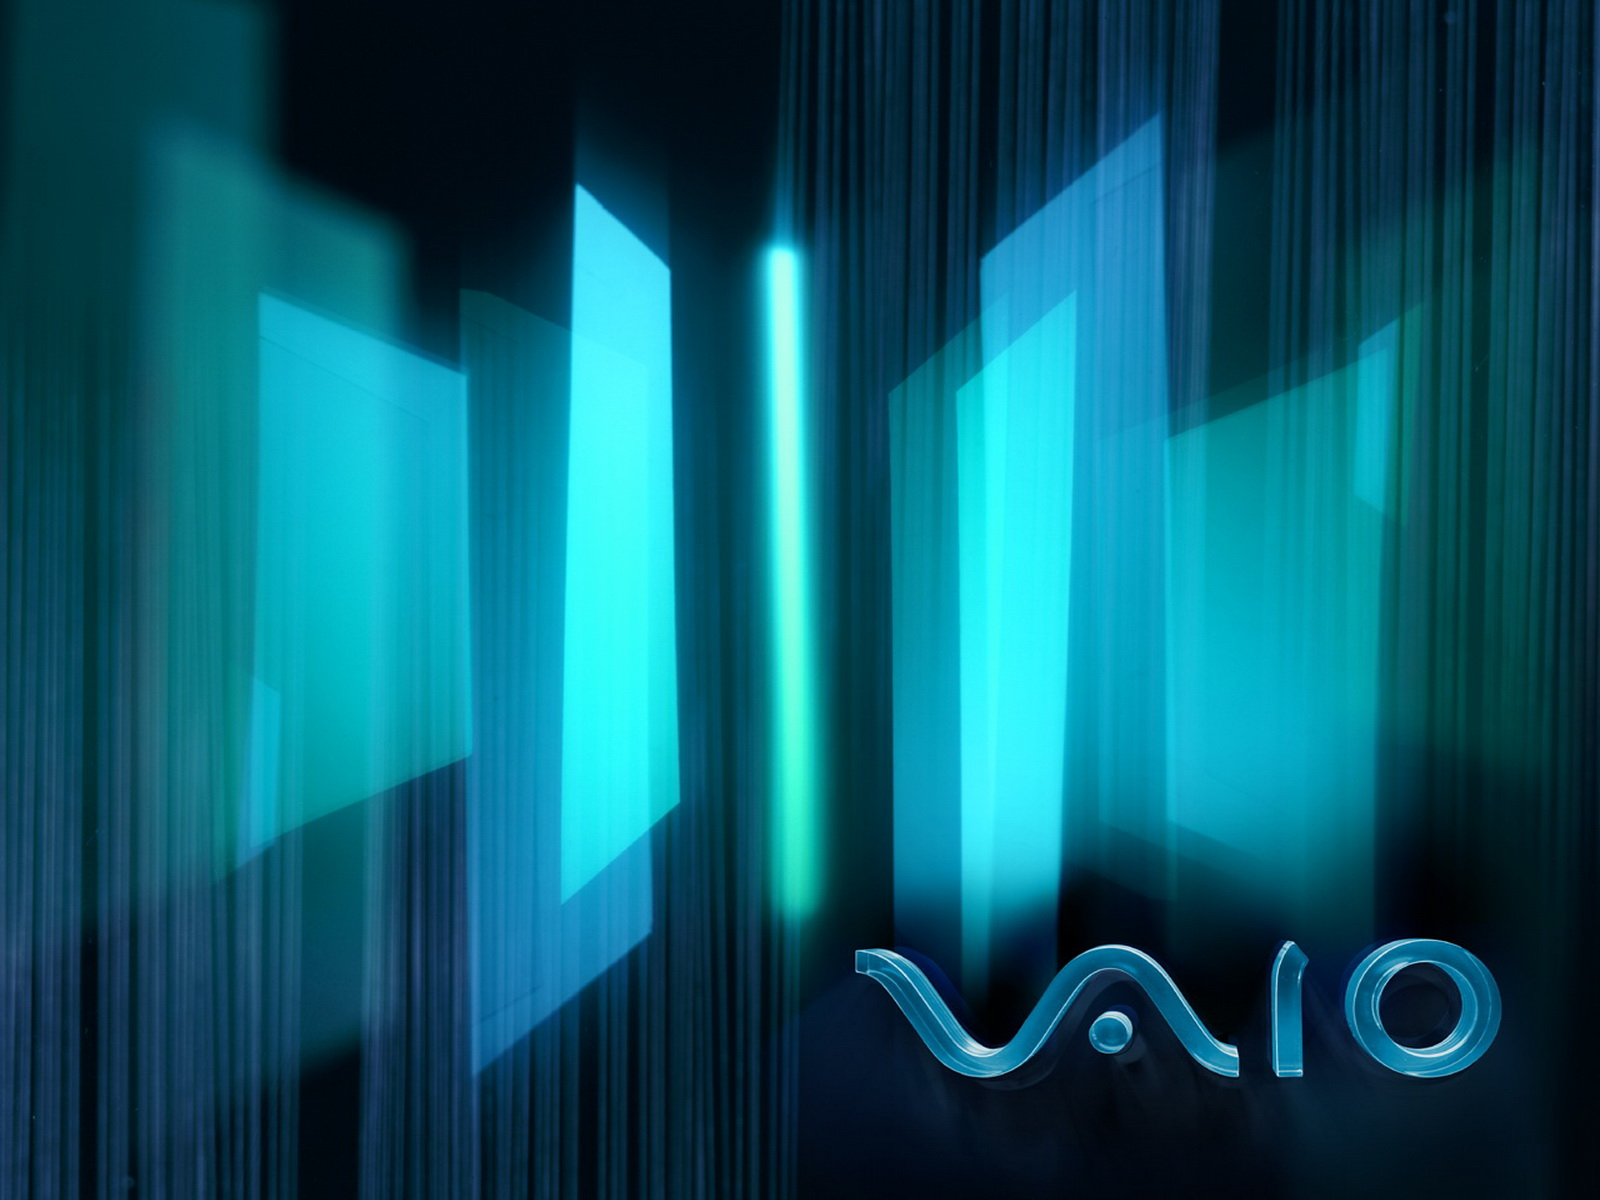 ... sony vaio wallpaper HD 10 ...